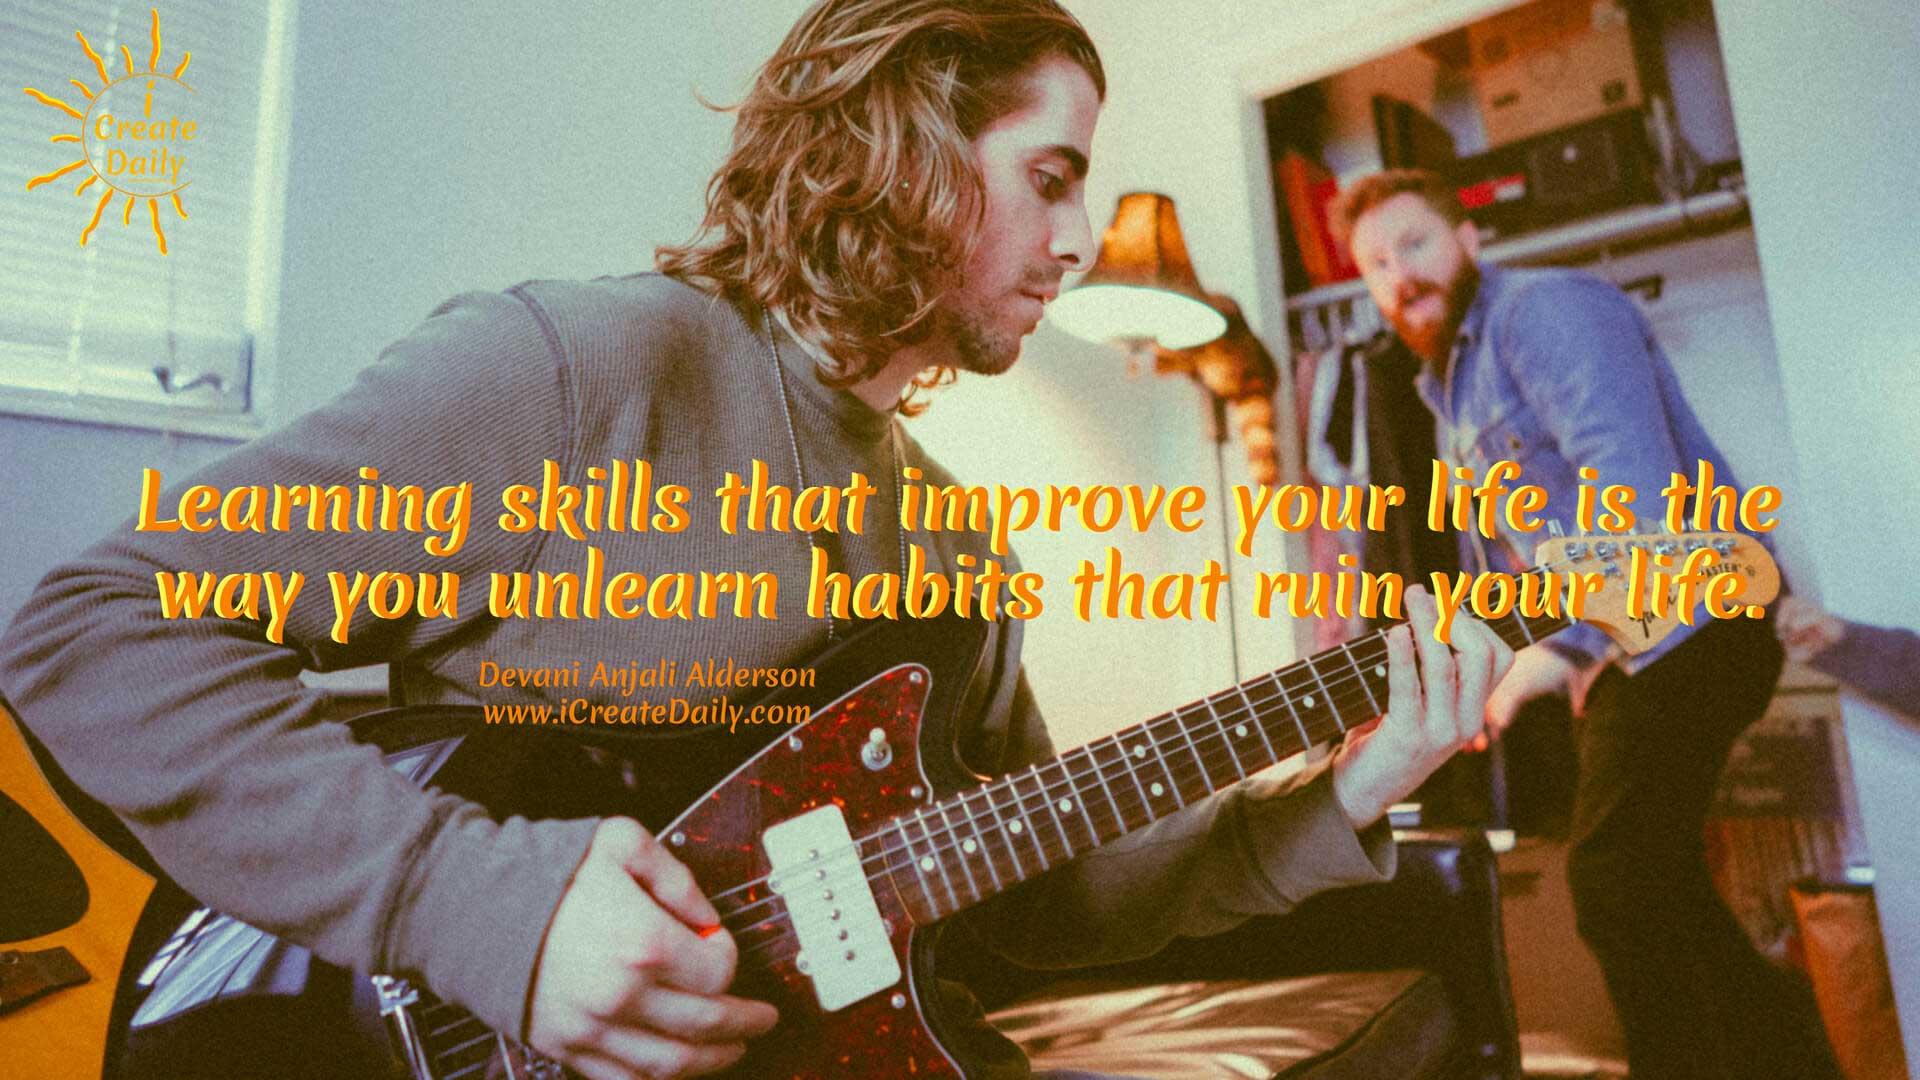 Learn Good Skills, Unlearn Bad Habits